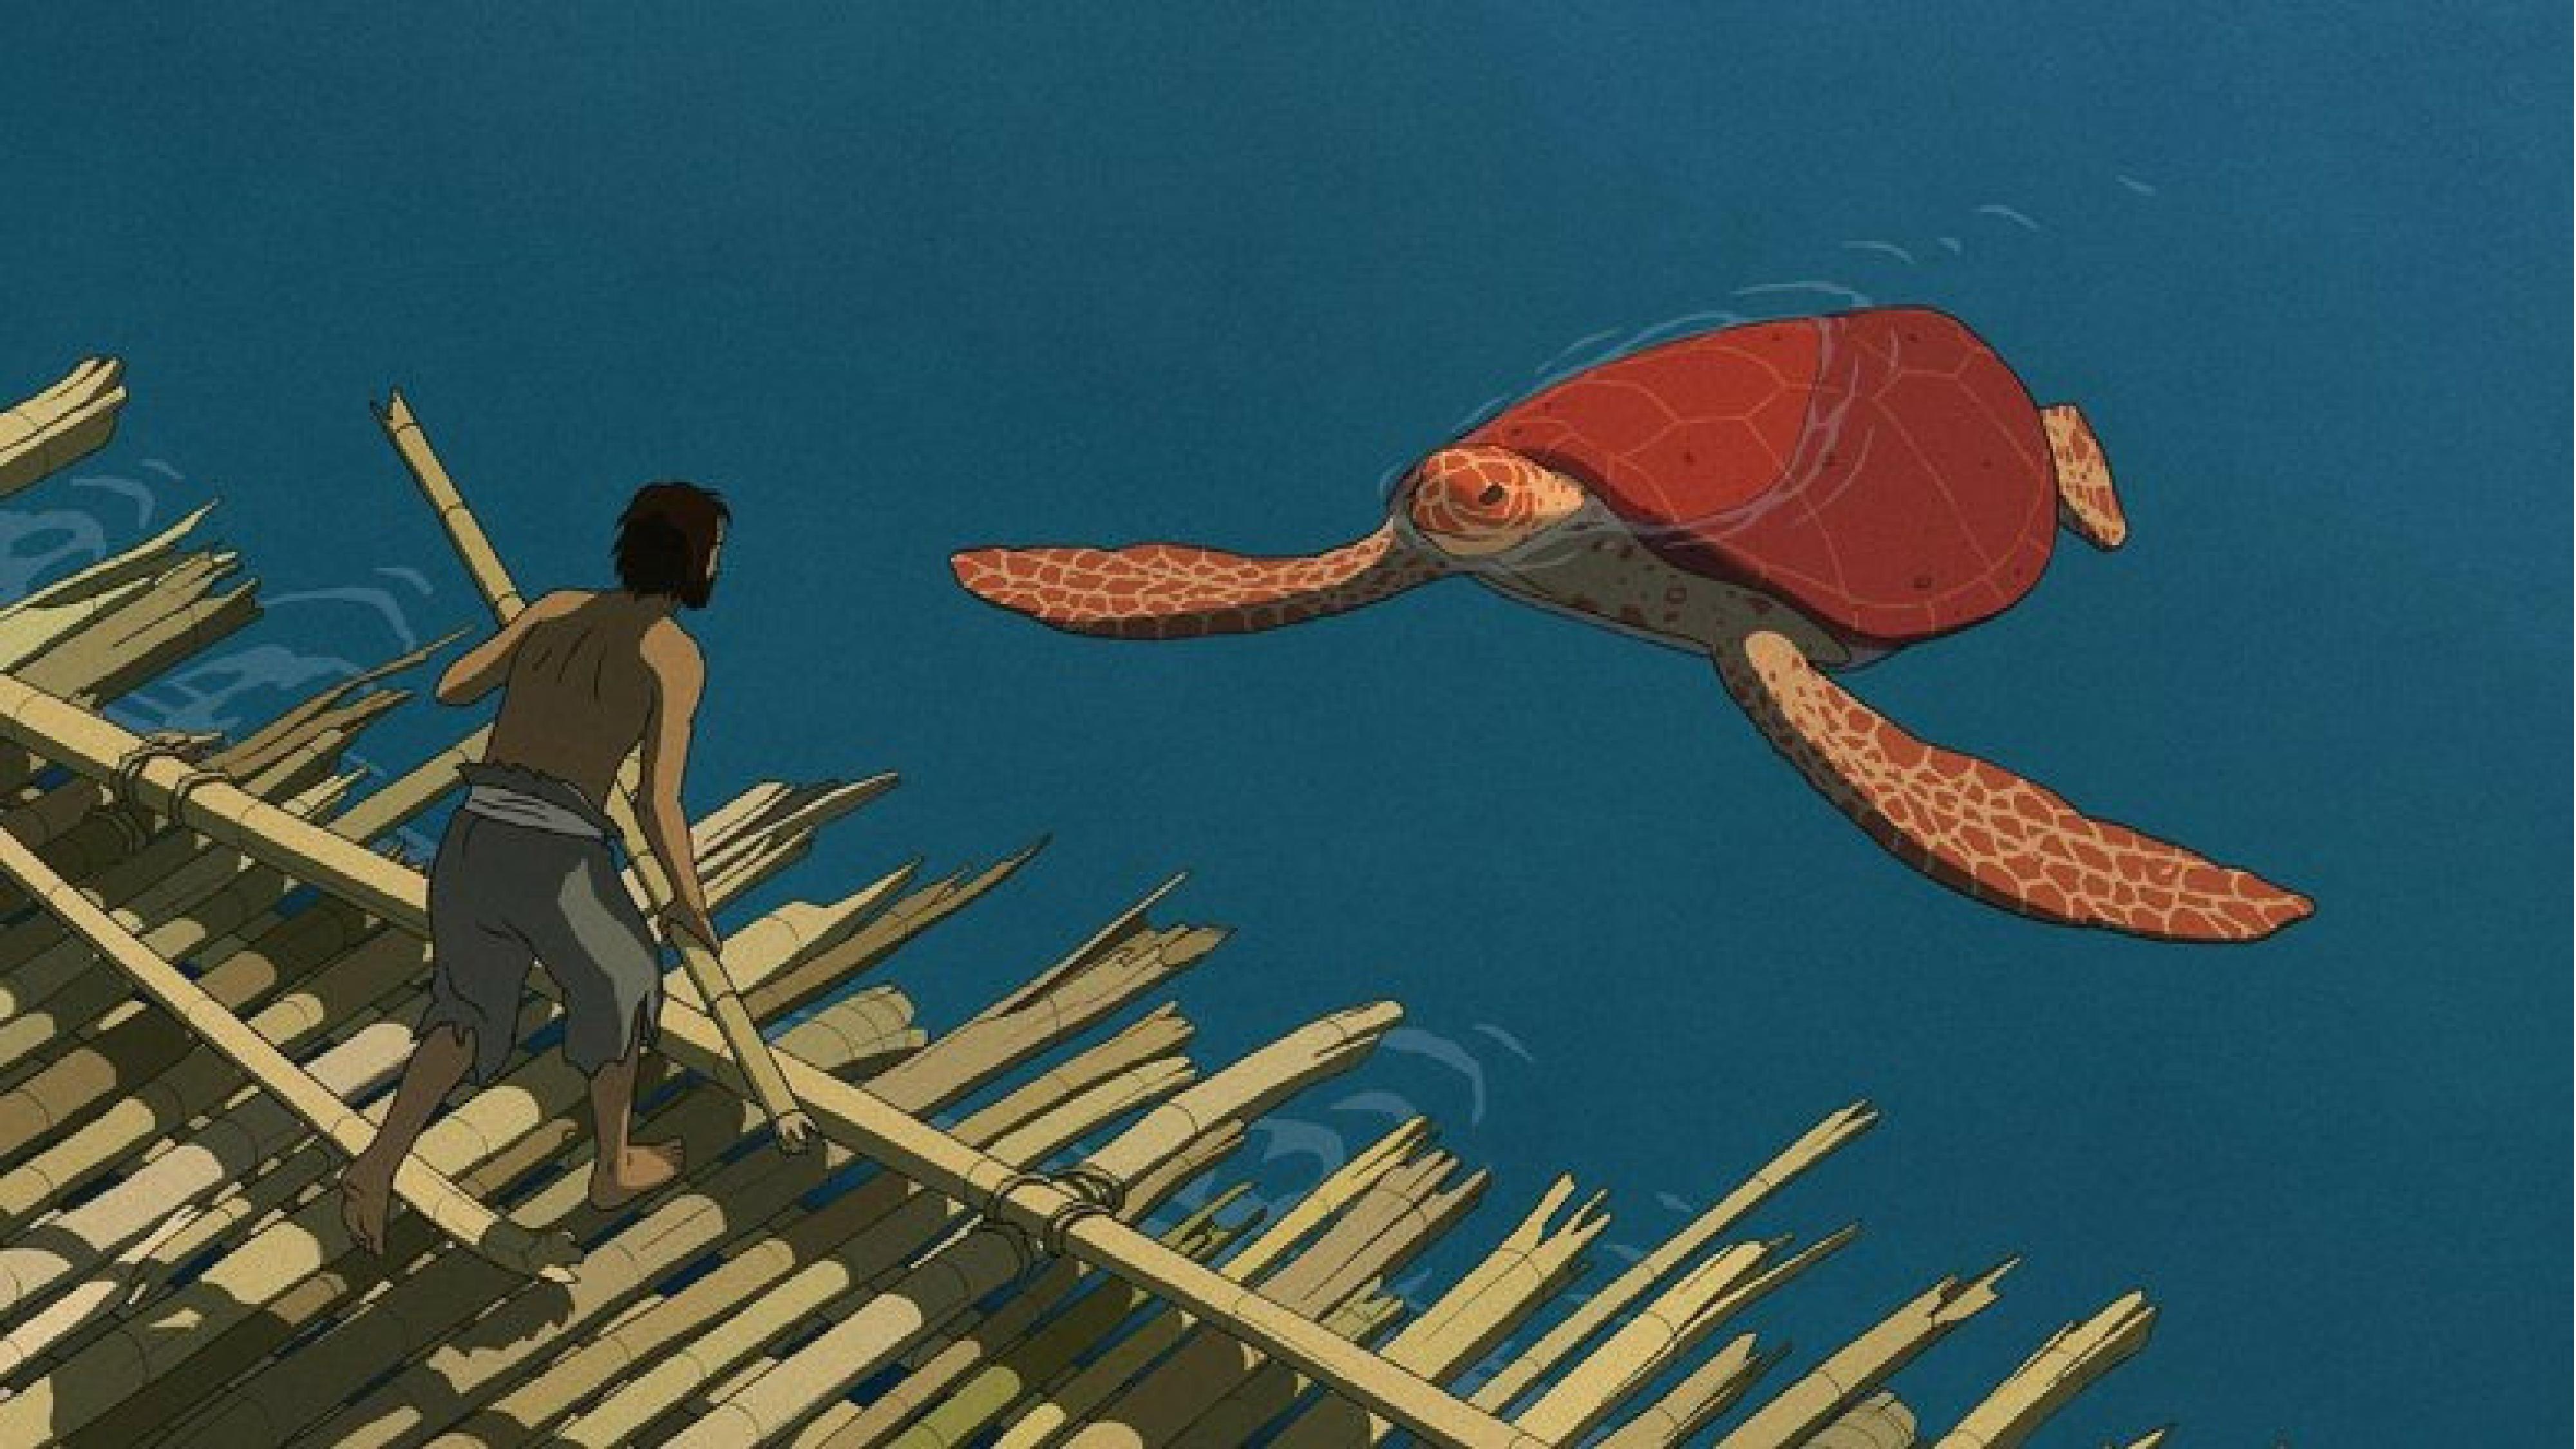 Poesia, spiritualità ed allegoria: La Tartaruga Rossa